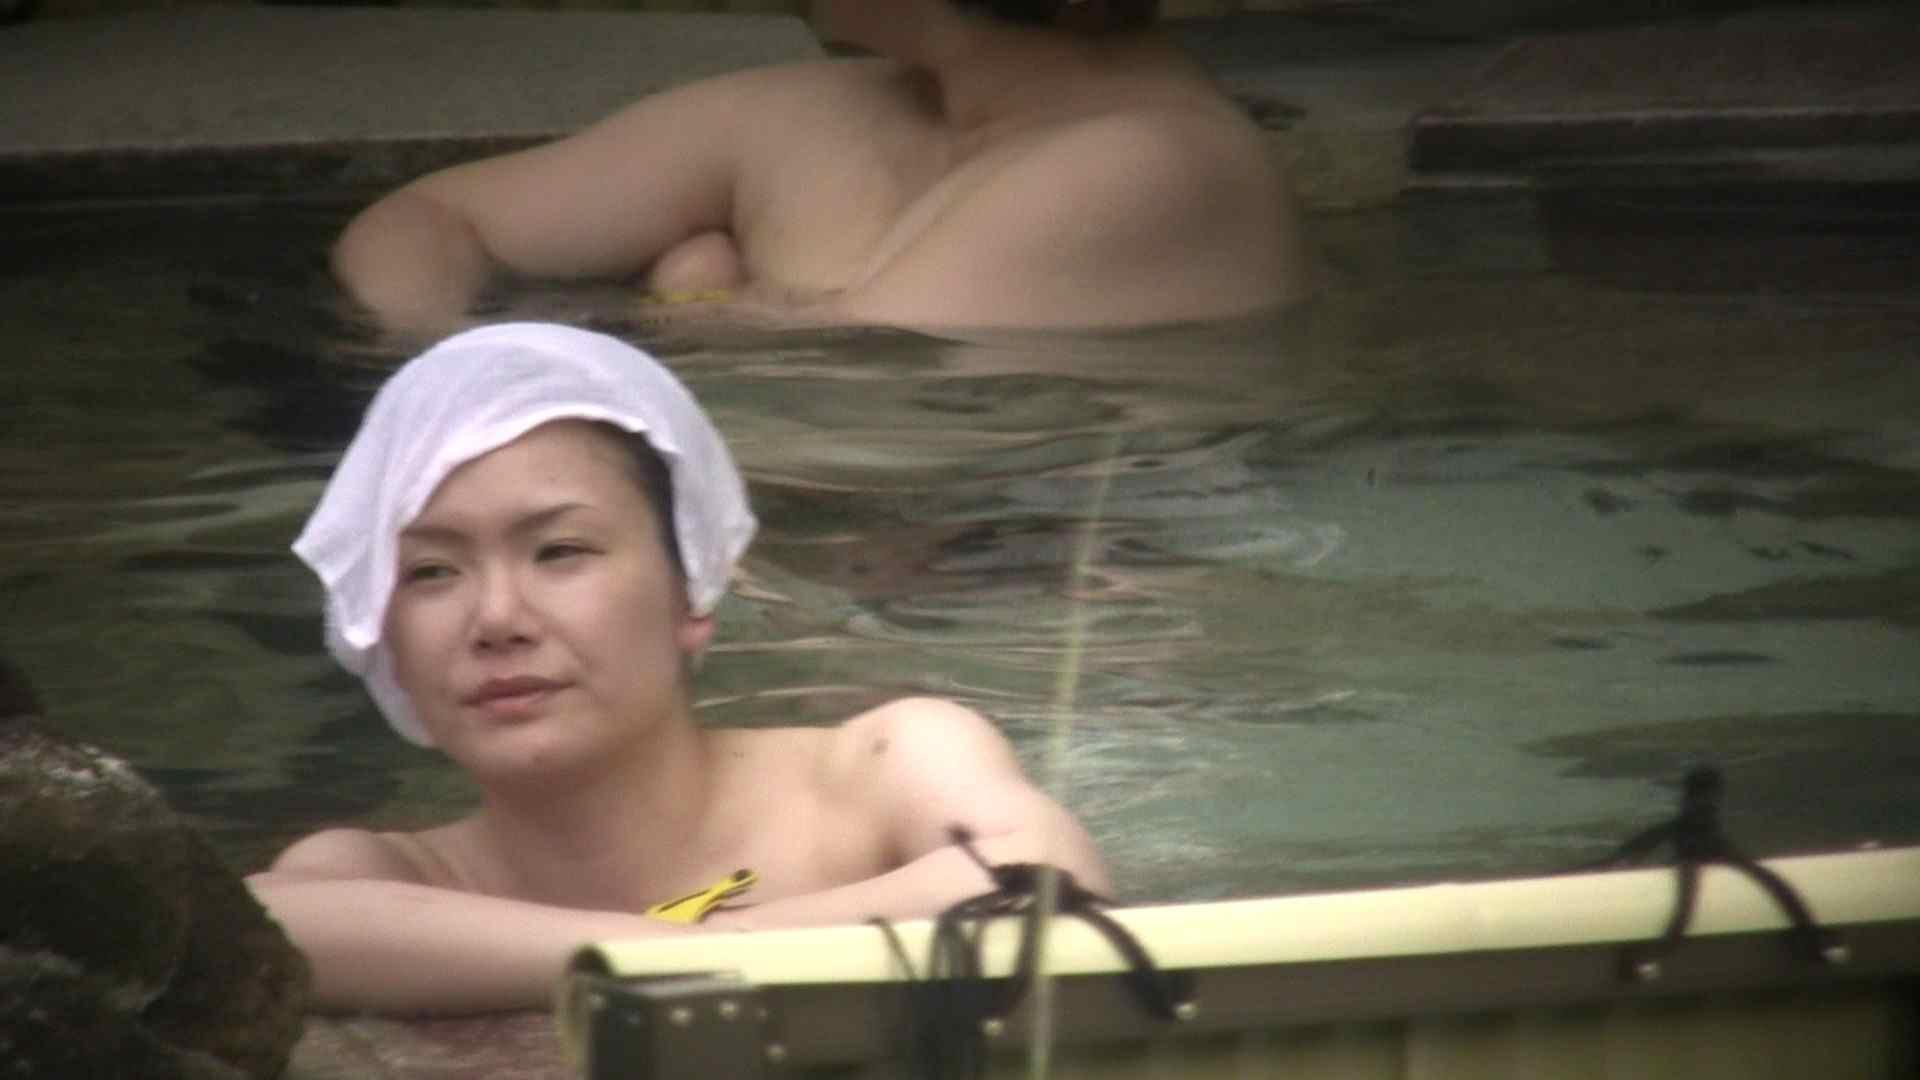 Aquaな露天風呂Vol.12【VIP】 盗撮師作品 セックス画像 78pic 5